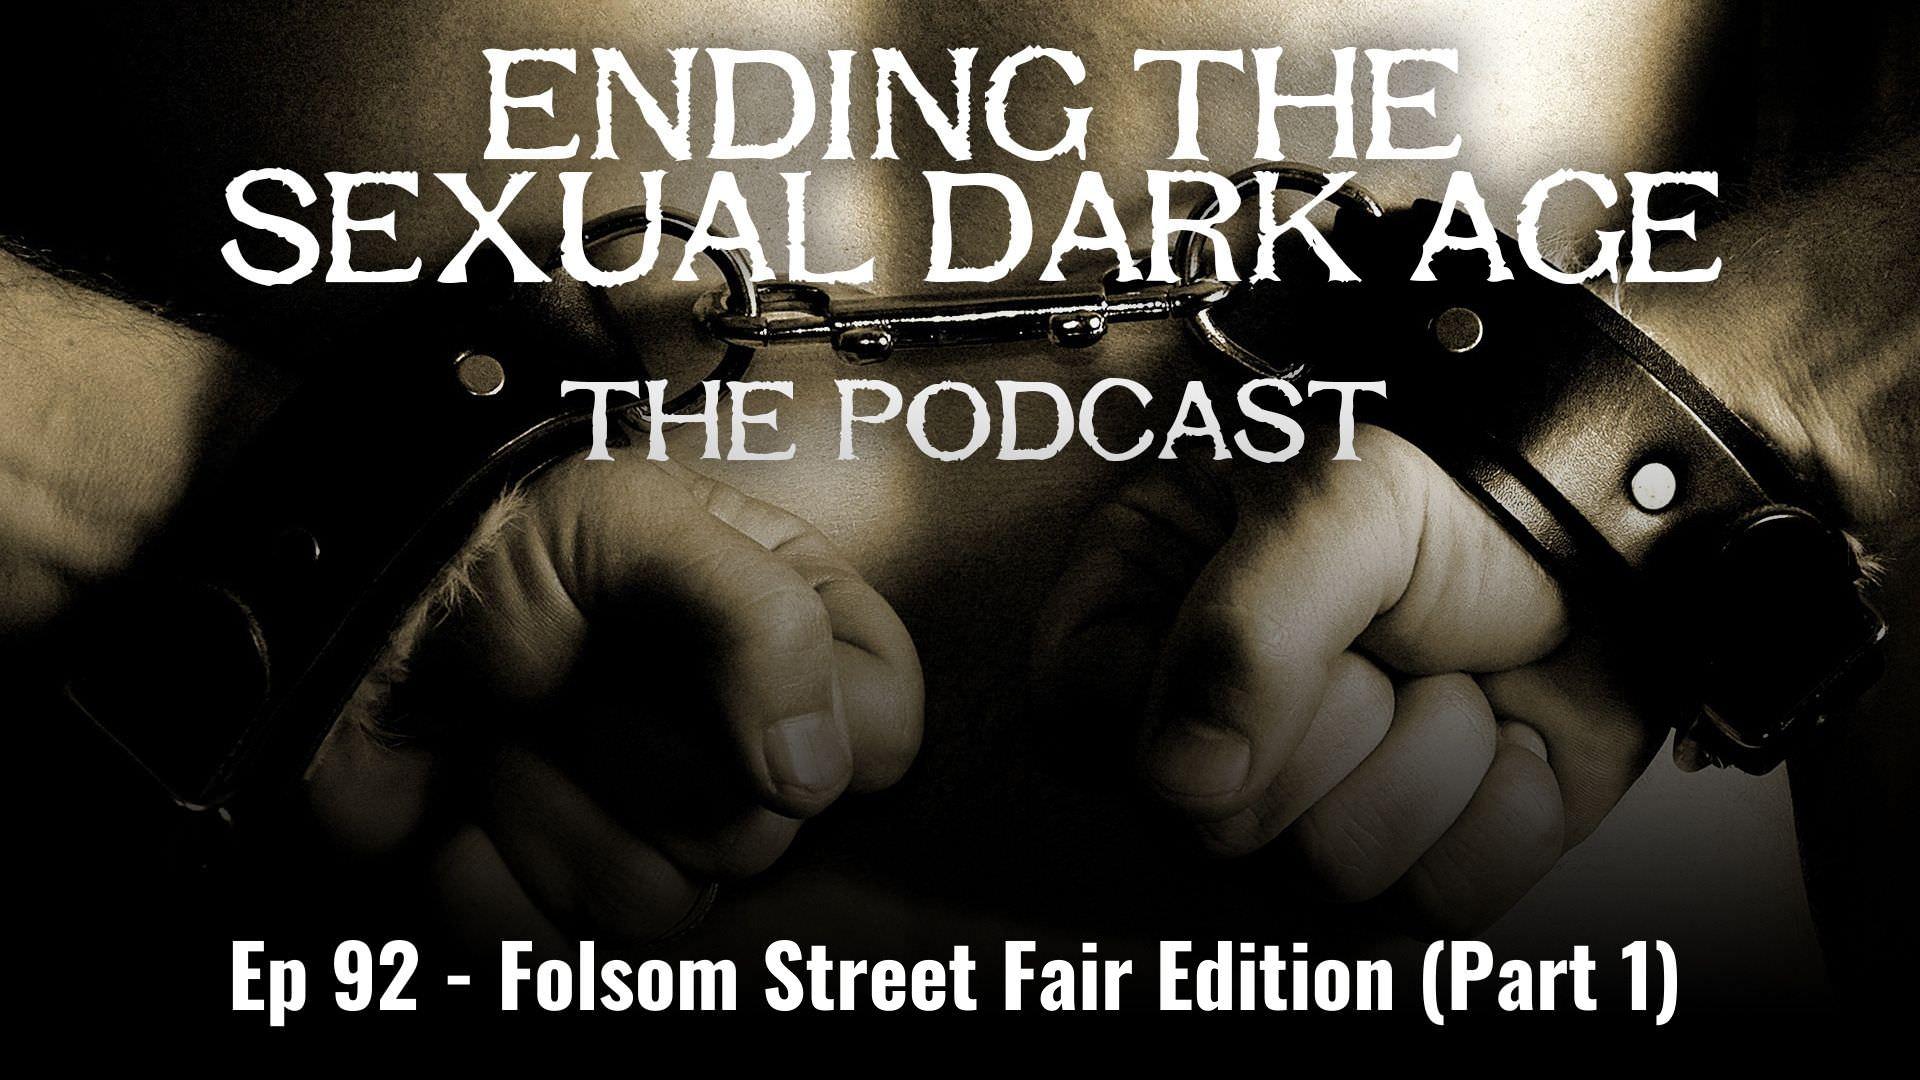 Episode 92 | Folsom Street Fair Edition, Part 1